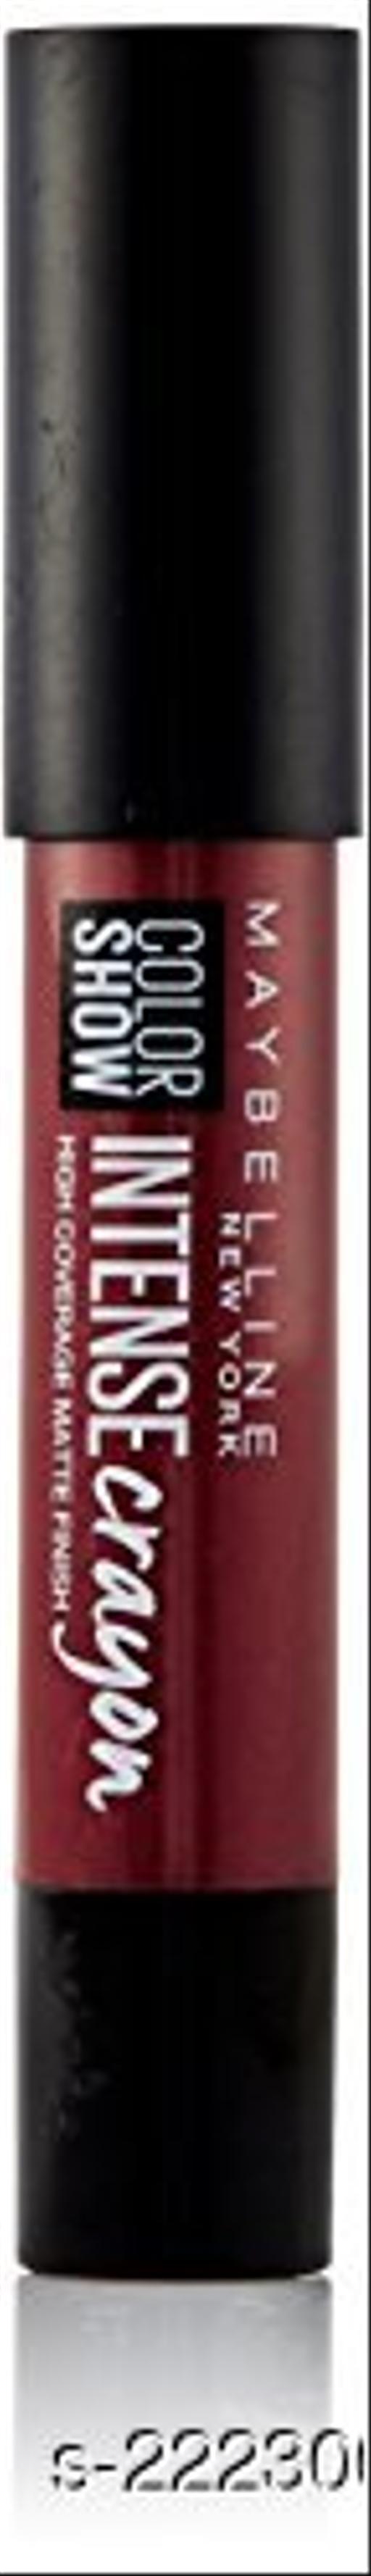 Maybelline New York Color Show Intense Lip Crayon, Dark Chocolate, 3.5g